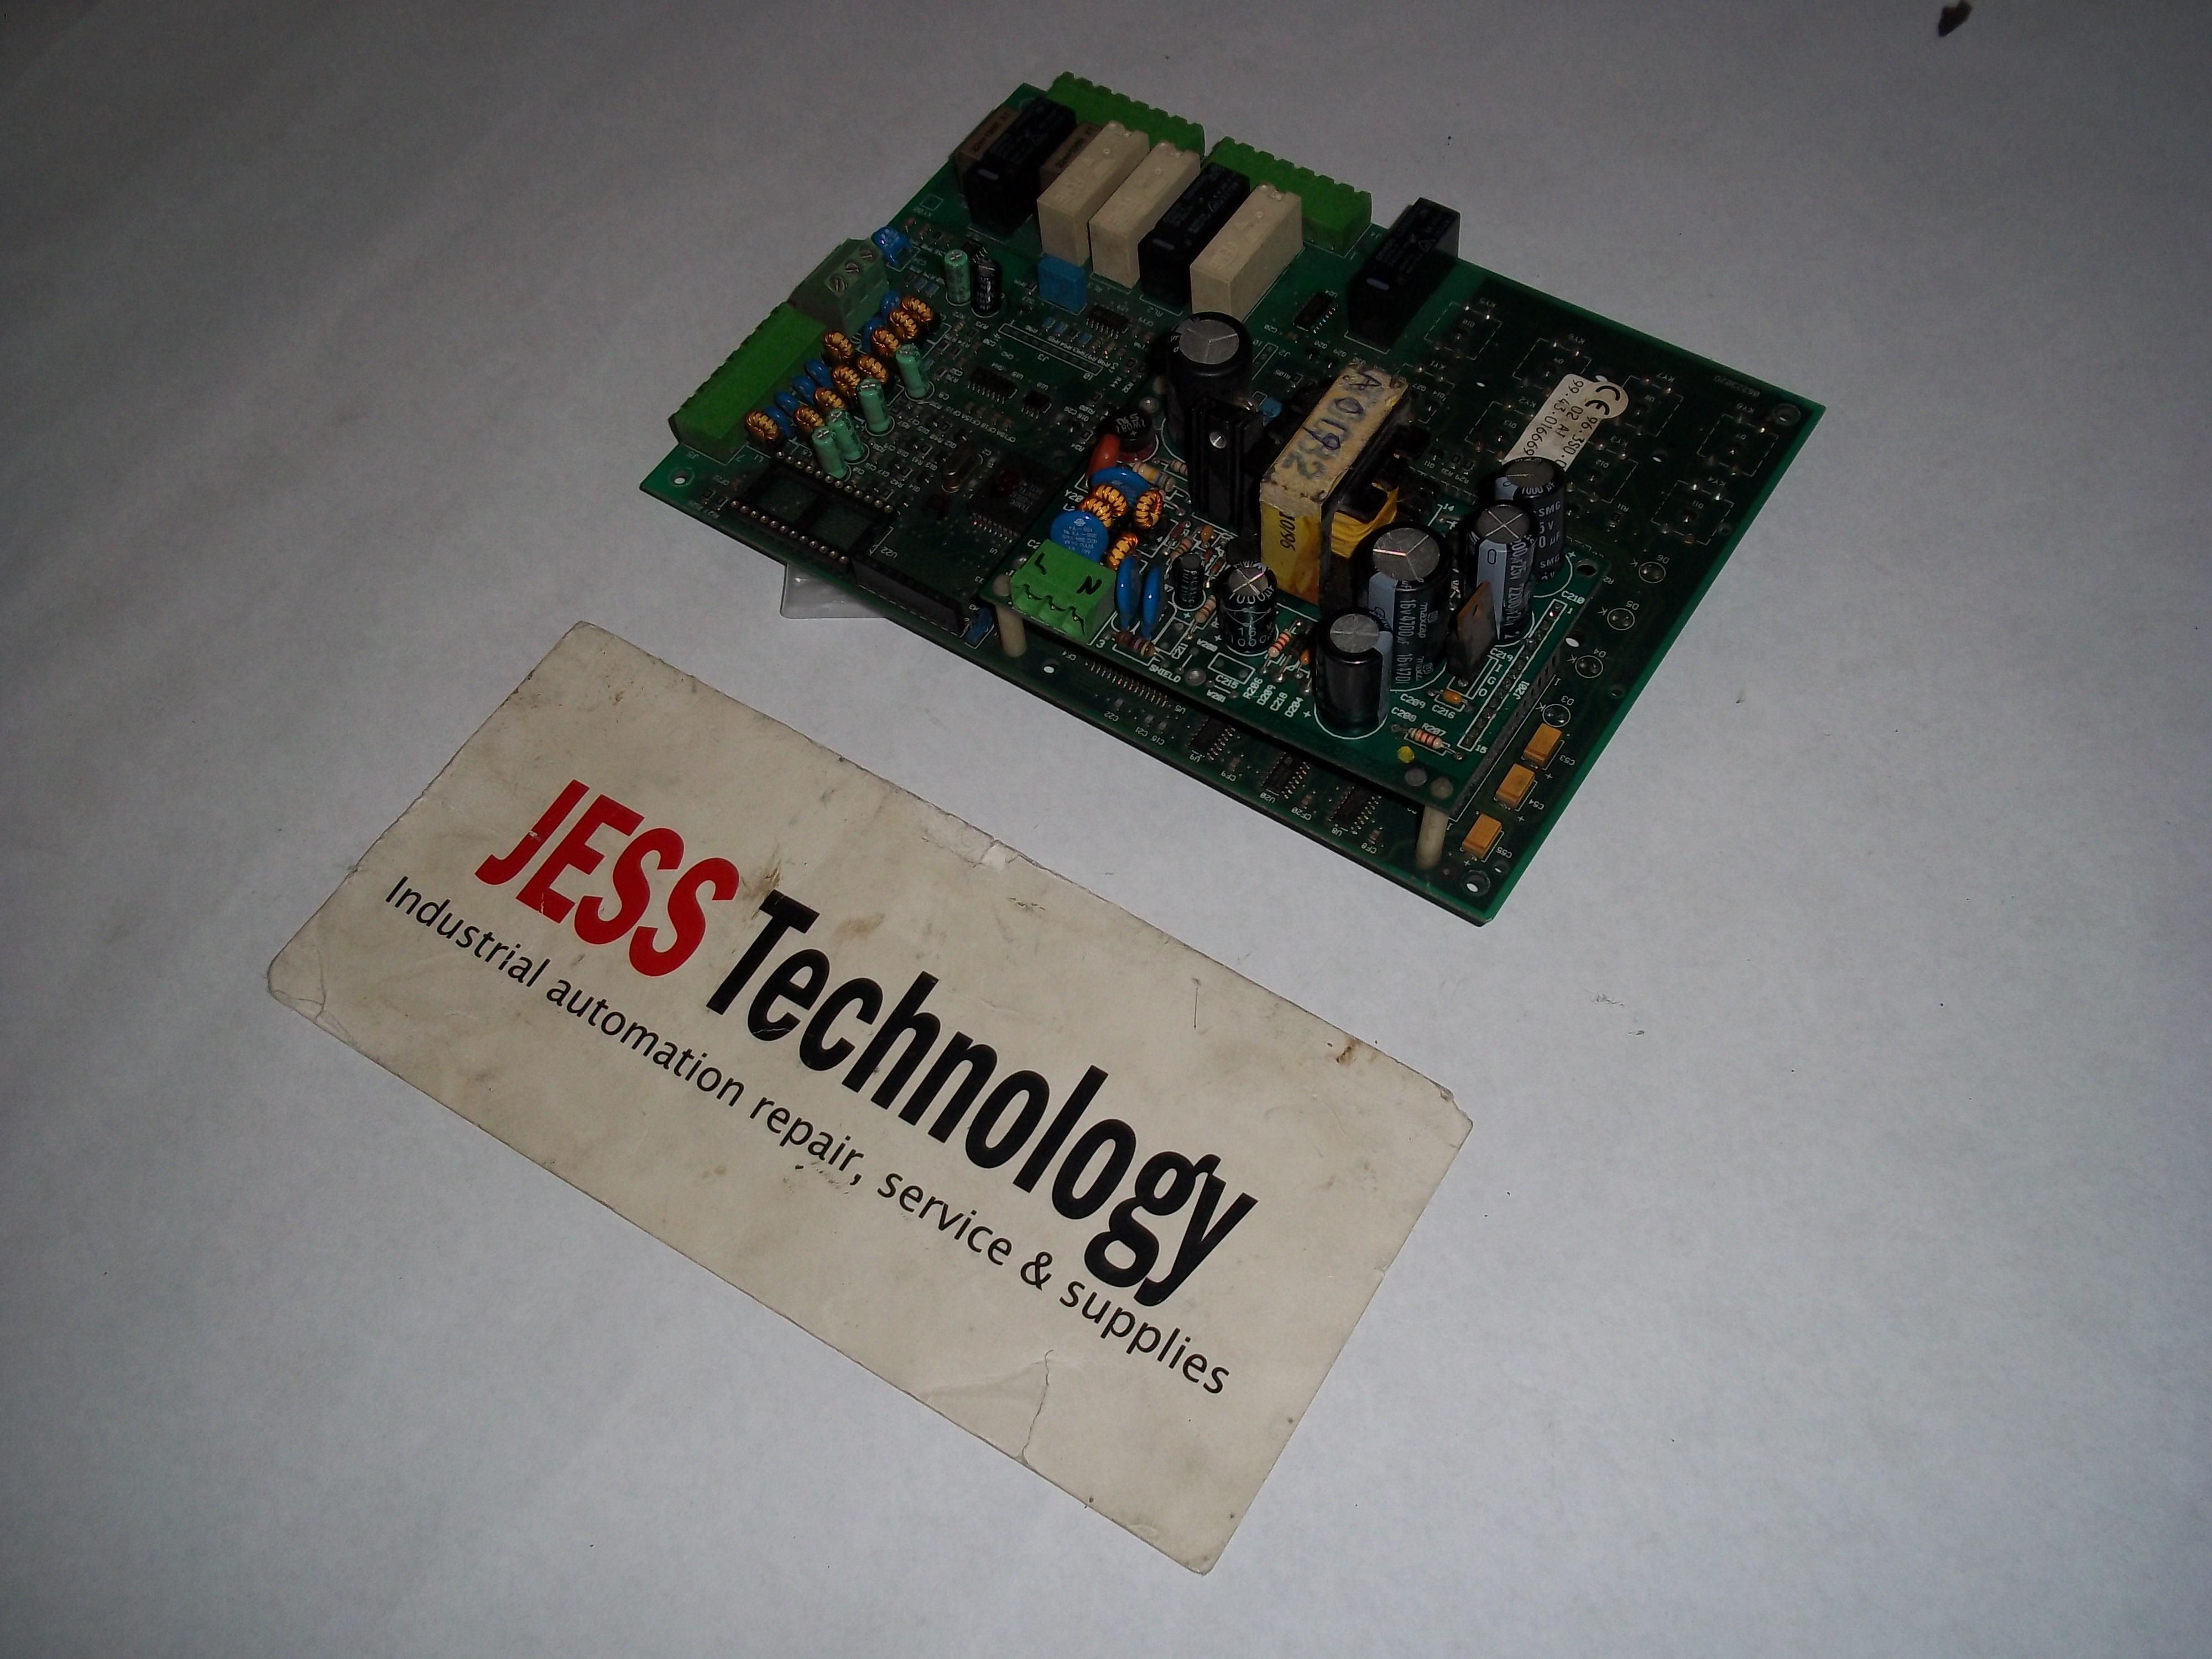 Repair 99.43.016669 EVCO  PCB BOARD (A019) (B3388) in Malaysia, Singapore, Thailand, Indonesia